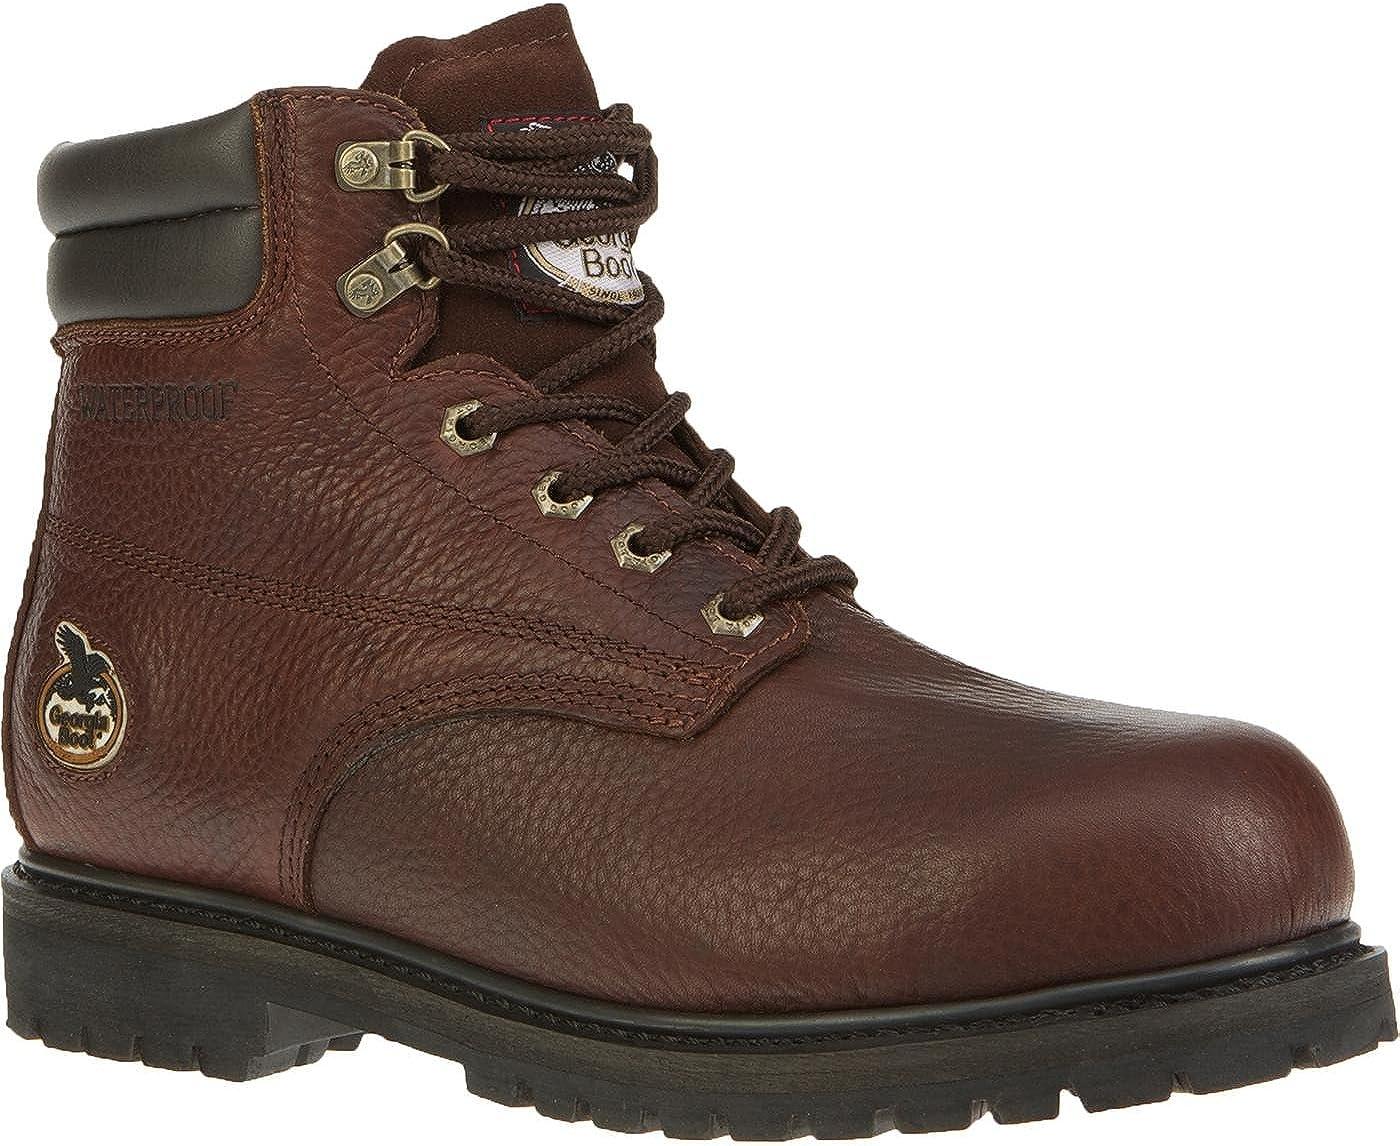 Don't miss the campaign Georgia Men's Oiler Steel Toe Shoe-G6174 M11 B Work Mail order cheap Waterproof